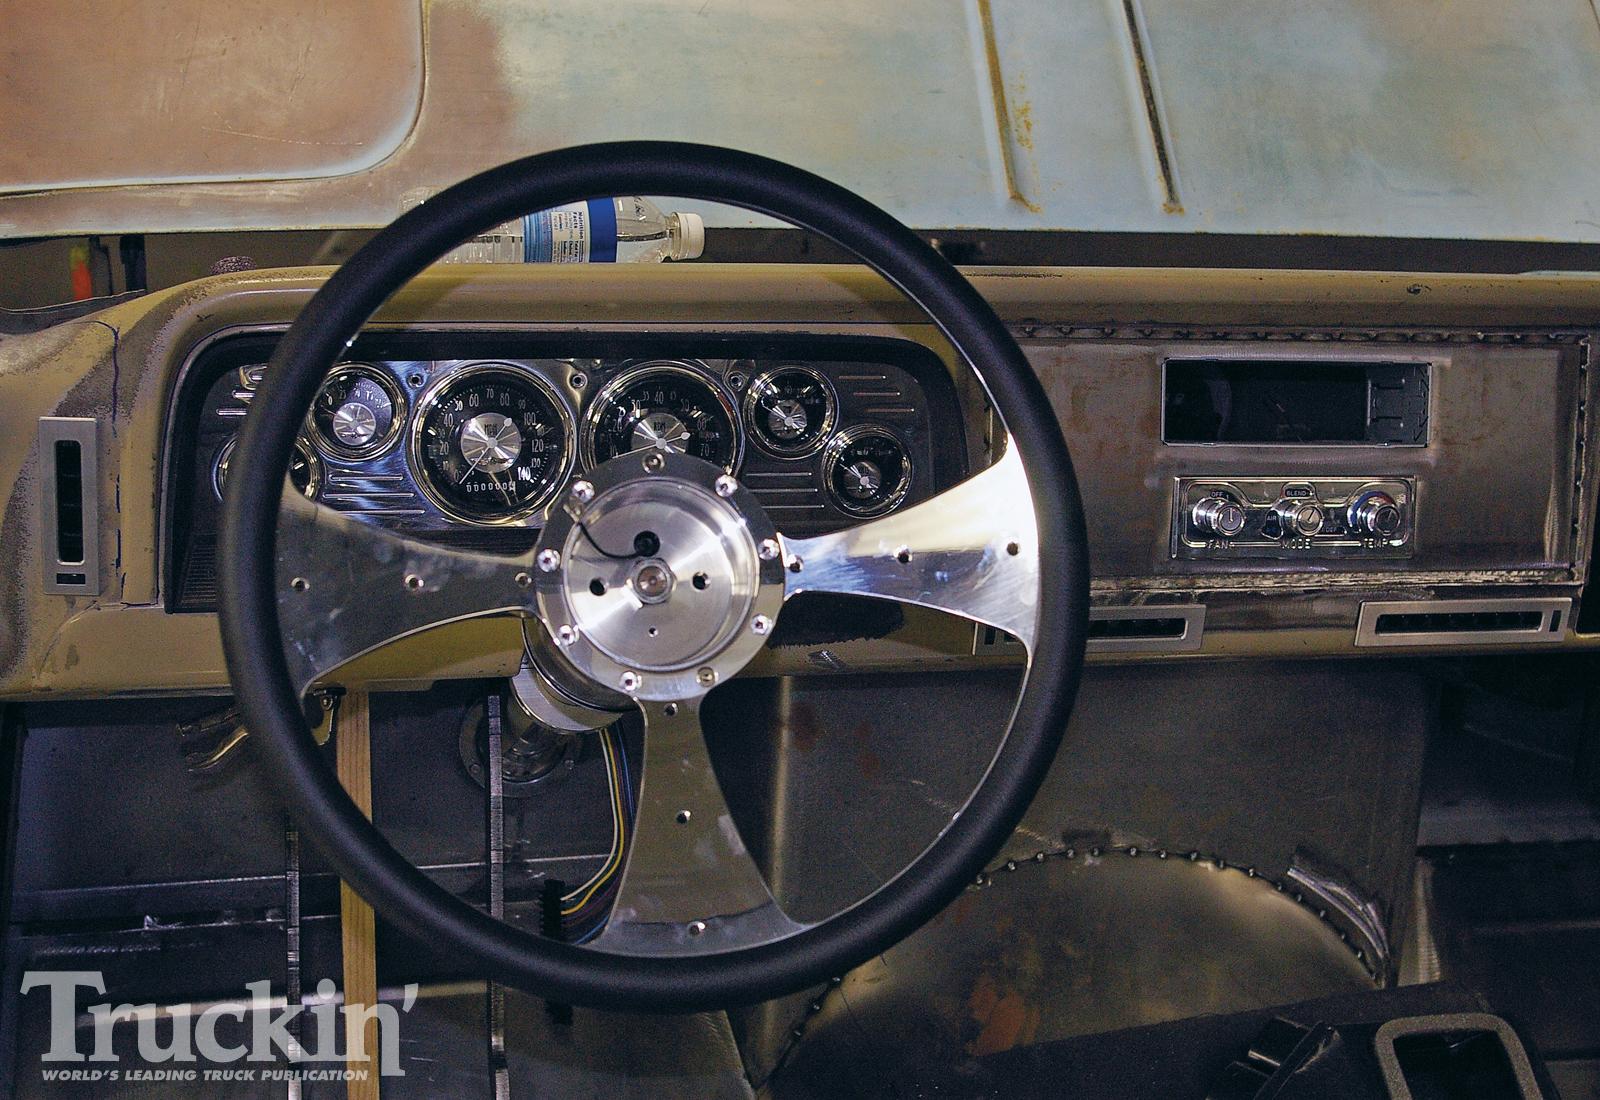 1965 Chevy C10 Buildup - Street Customs '65 C10 Build Photo & Image